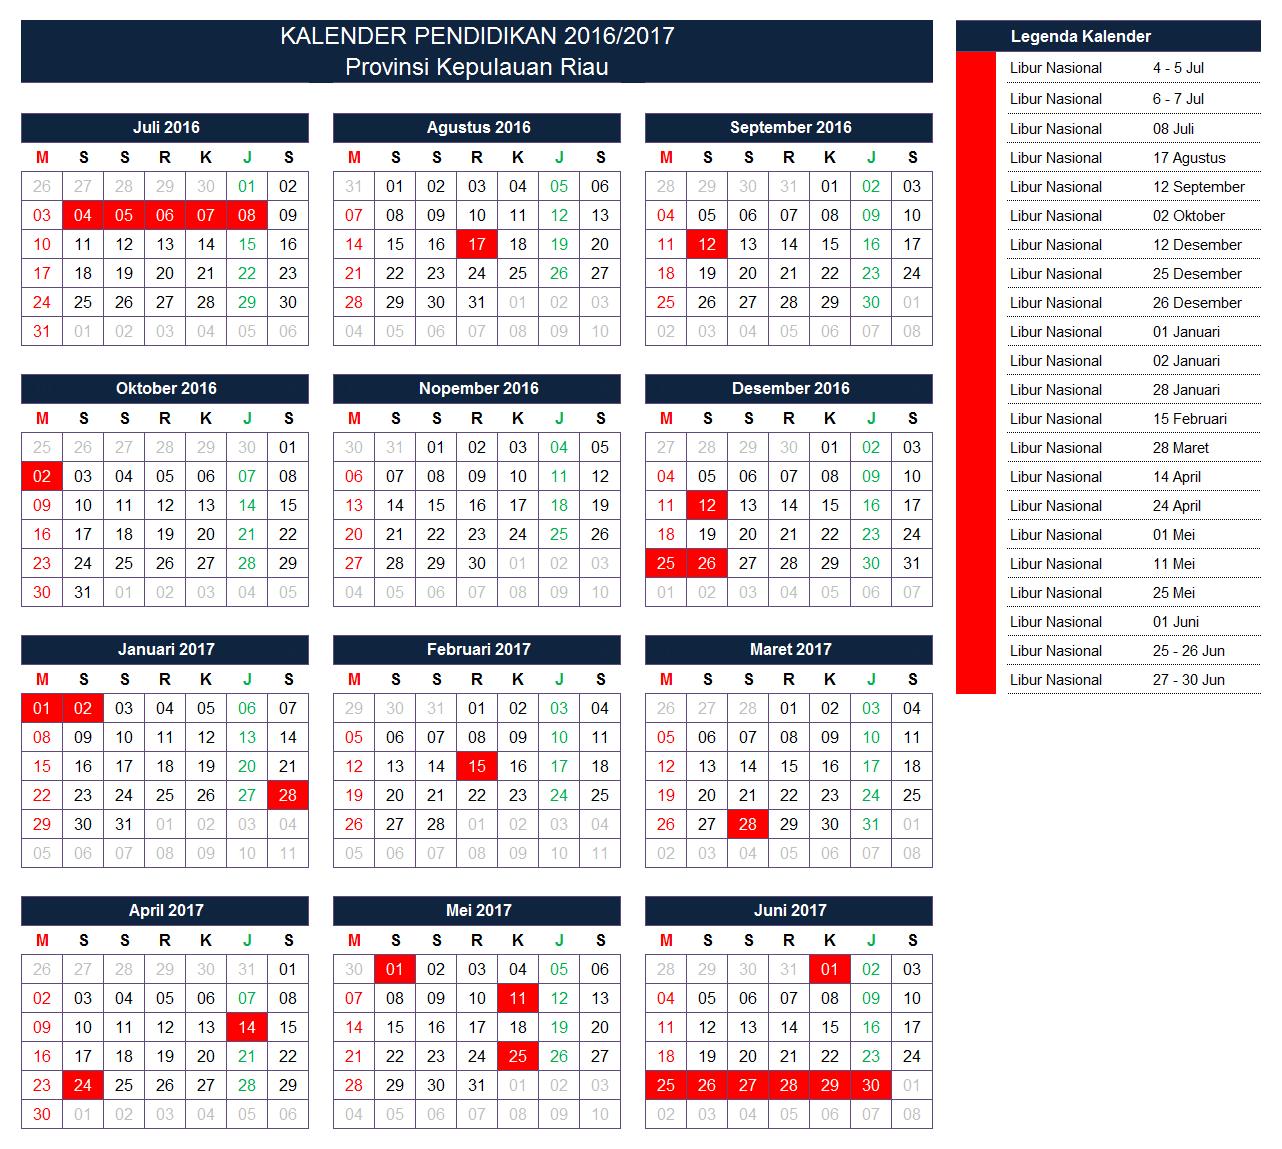 Kalender Pendidikan Provinsi Kepulauan Riau